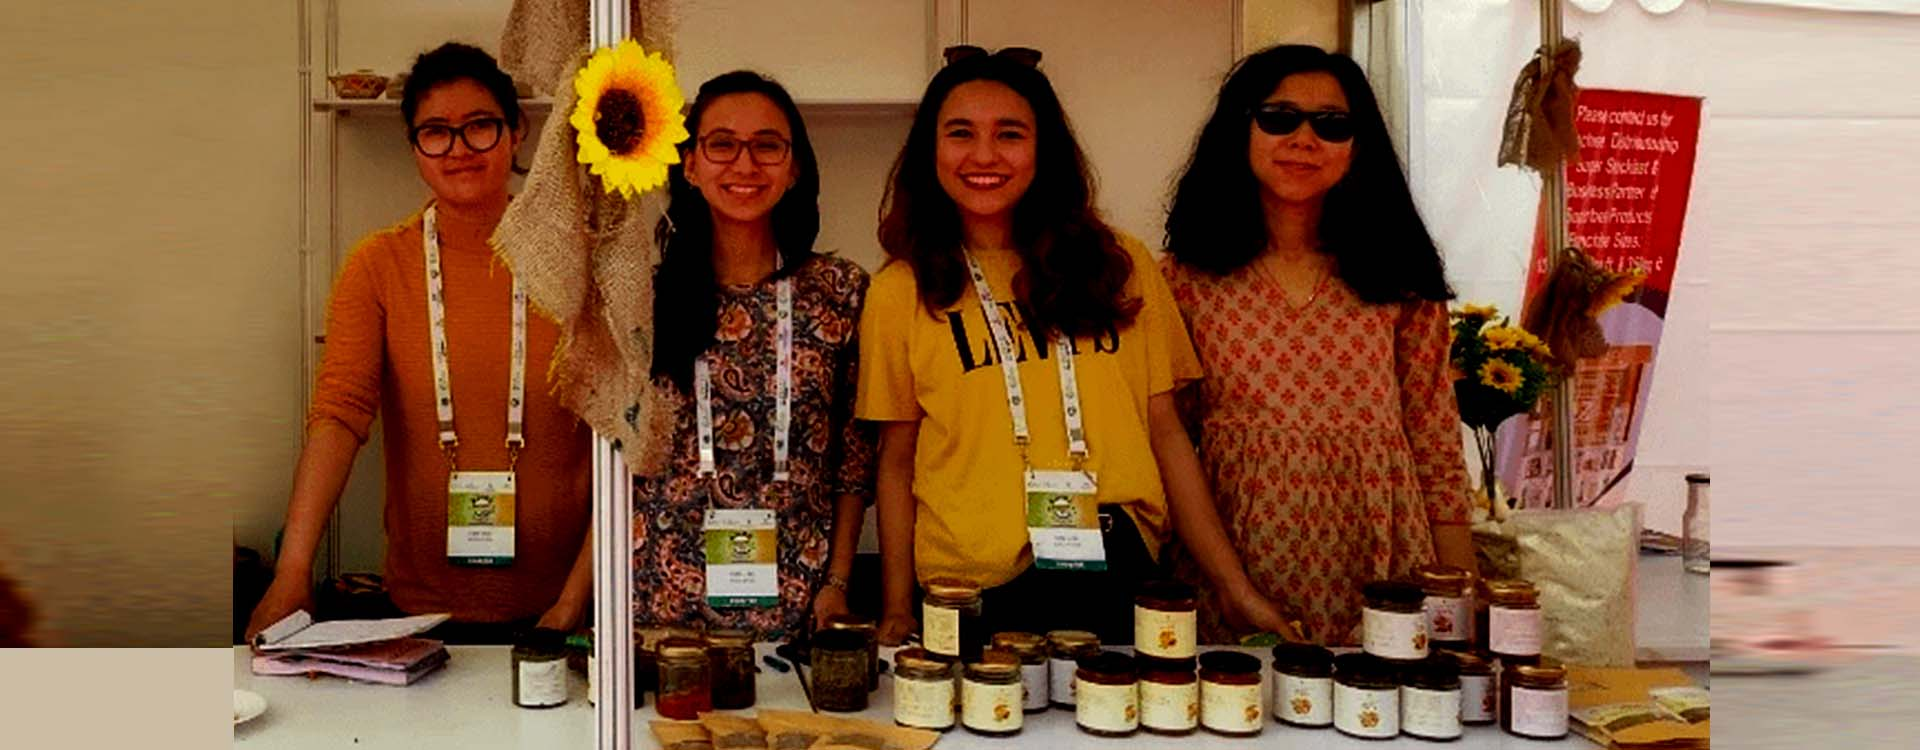 Kangla-Nyishar, A Ladakhi food culture startup